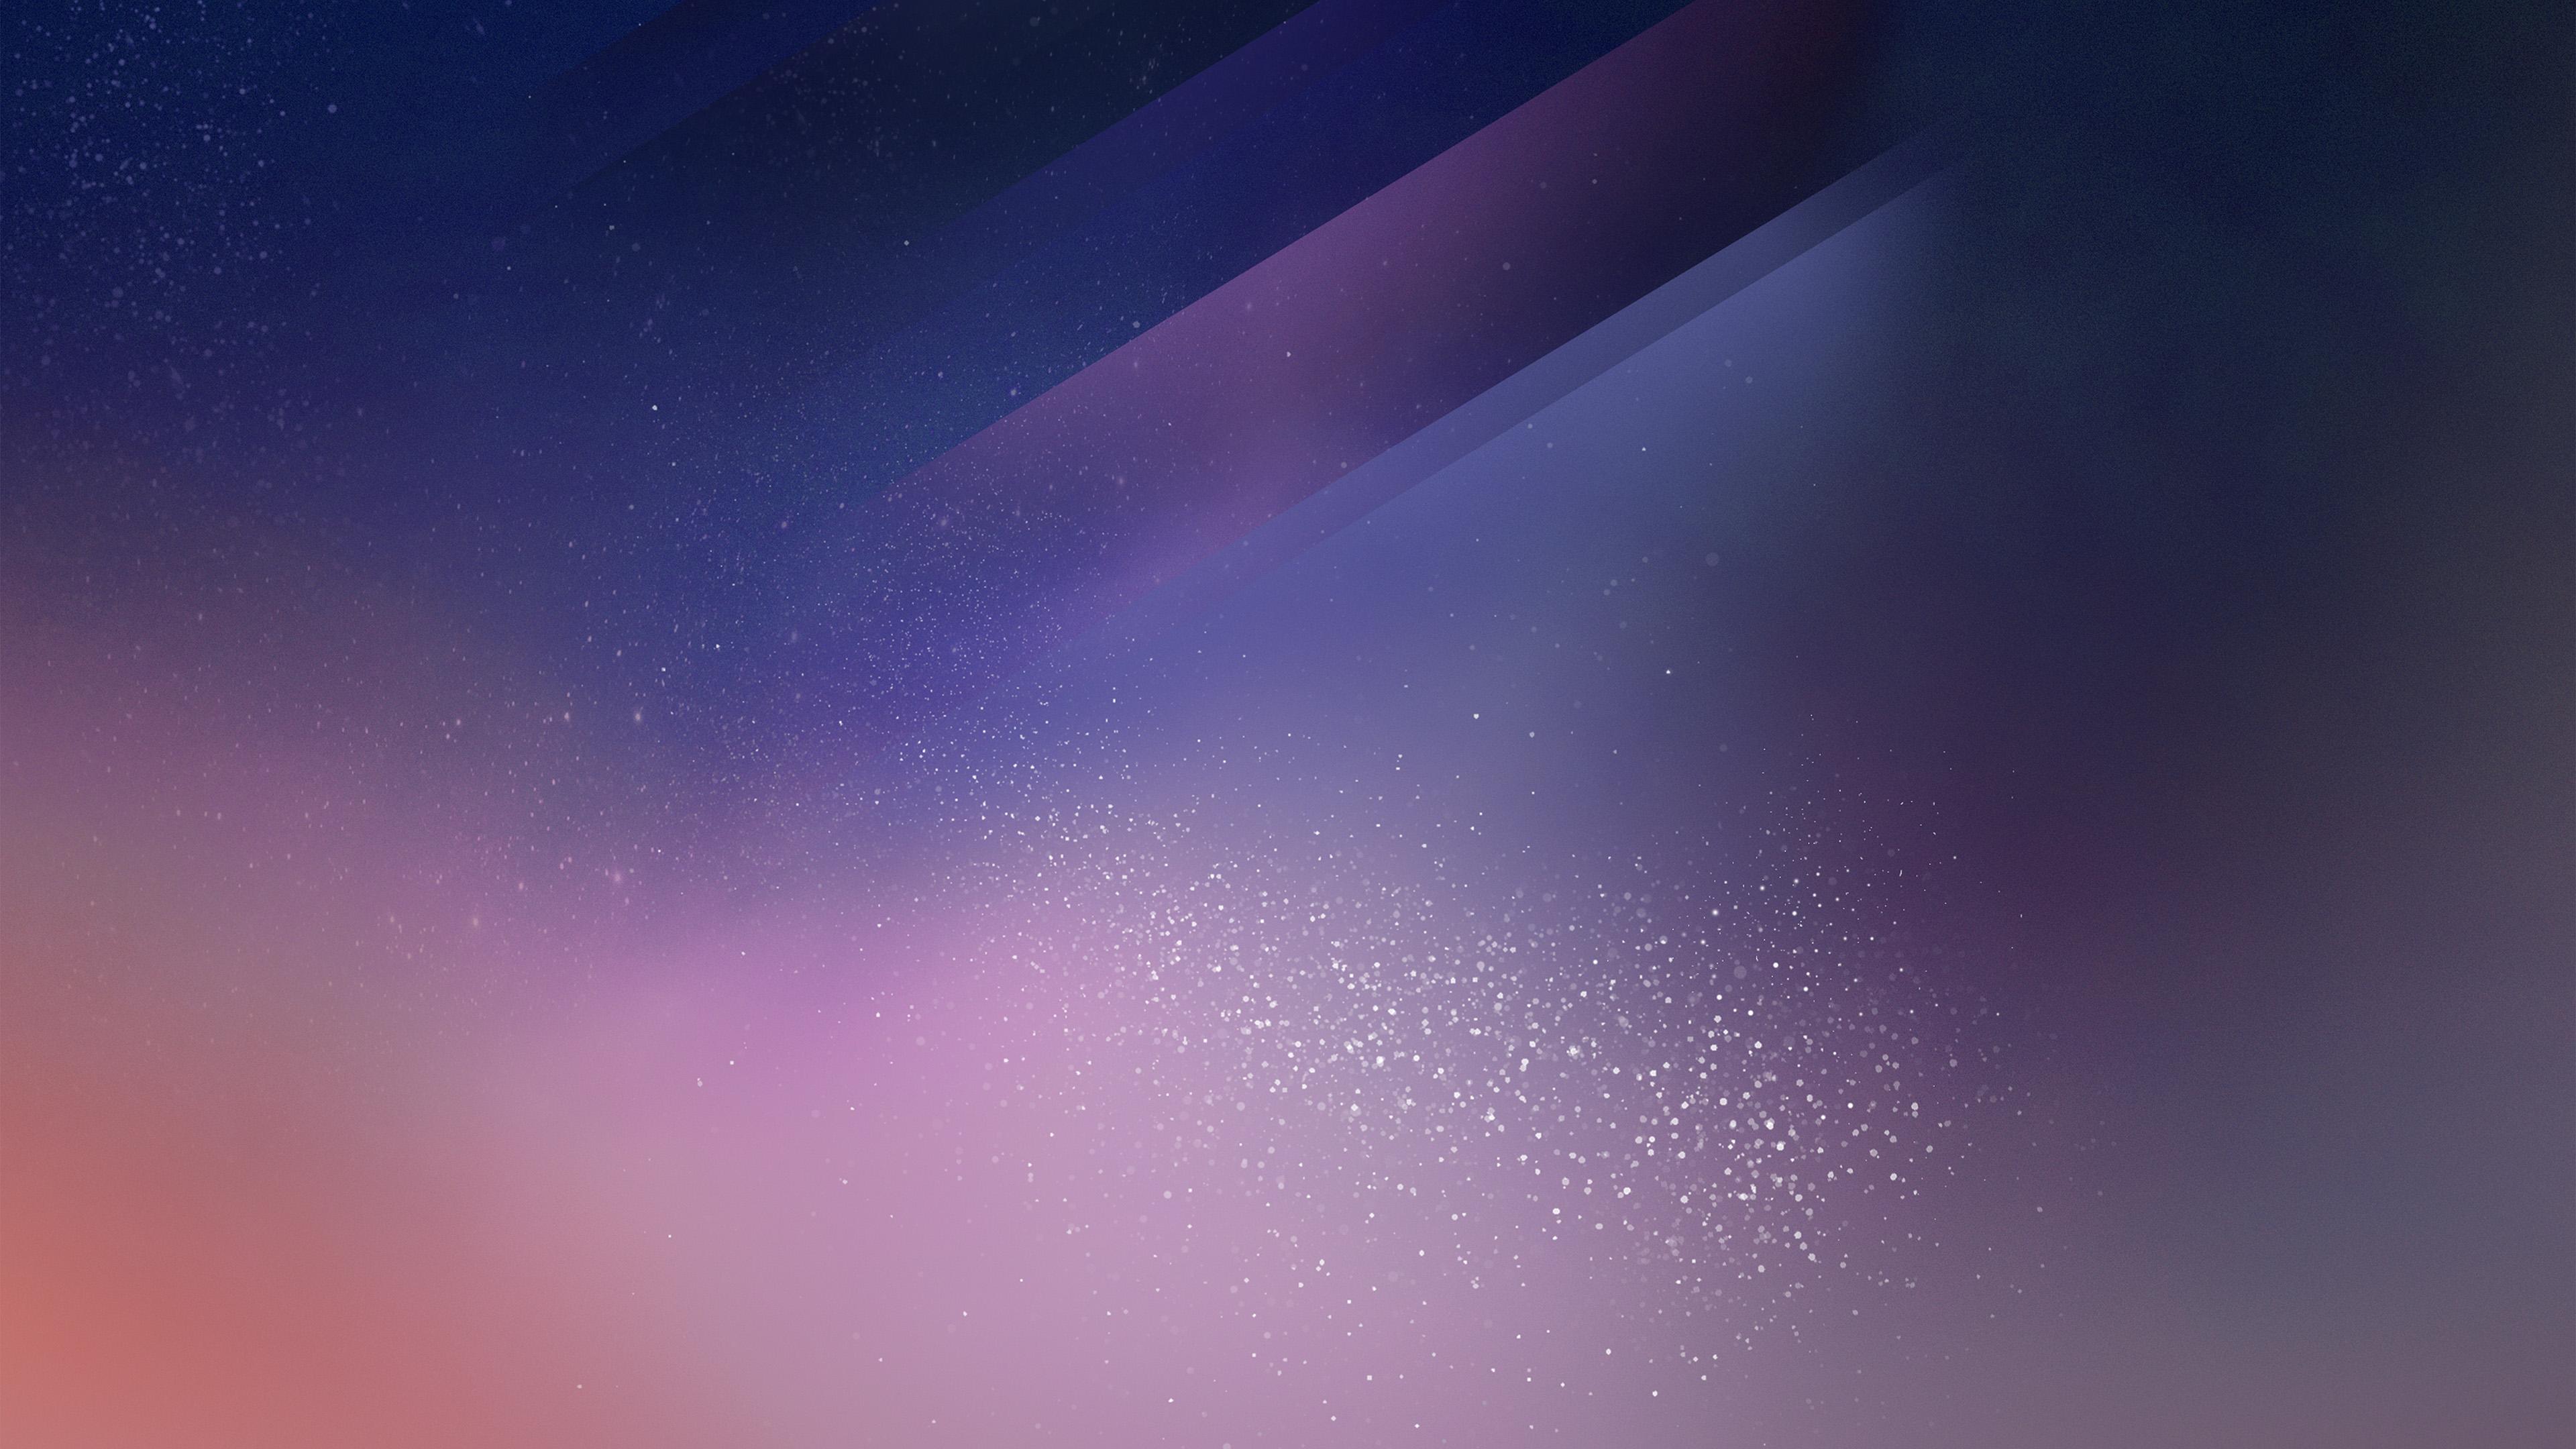 Vw12 Beautiful Galaxy S8 Samsung Dark Pattern Background Wallpaper